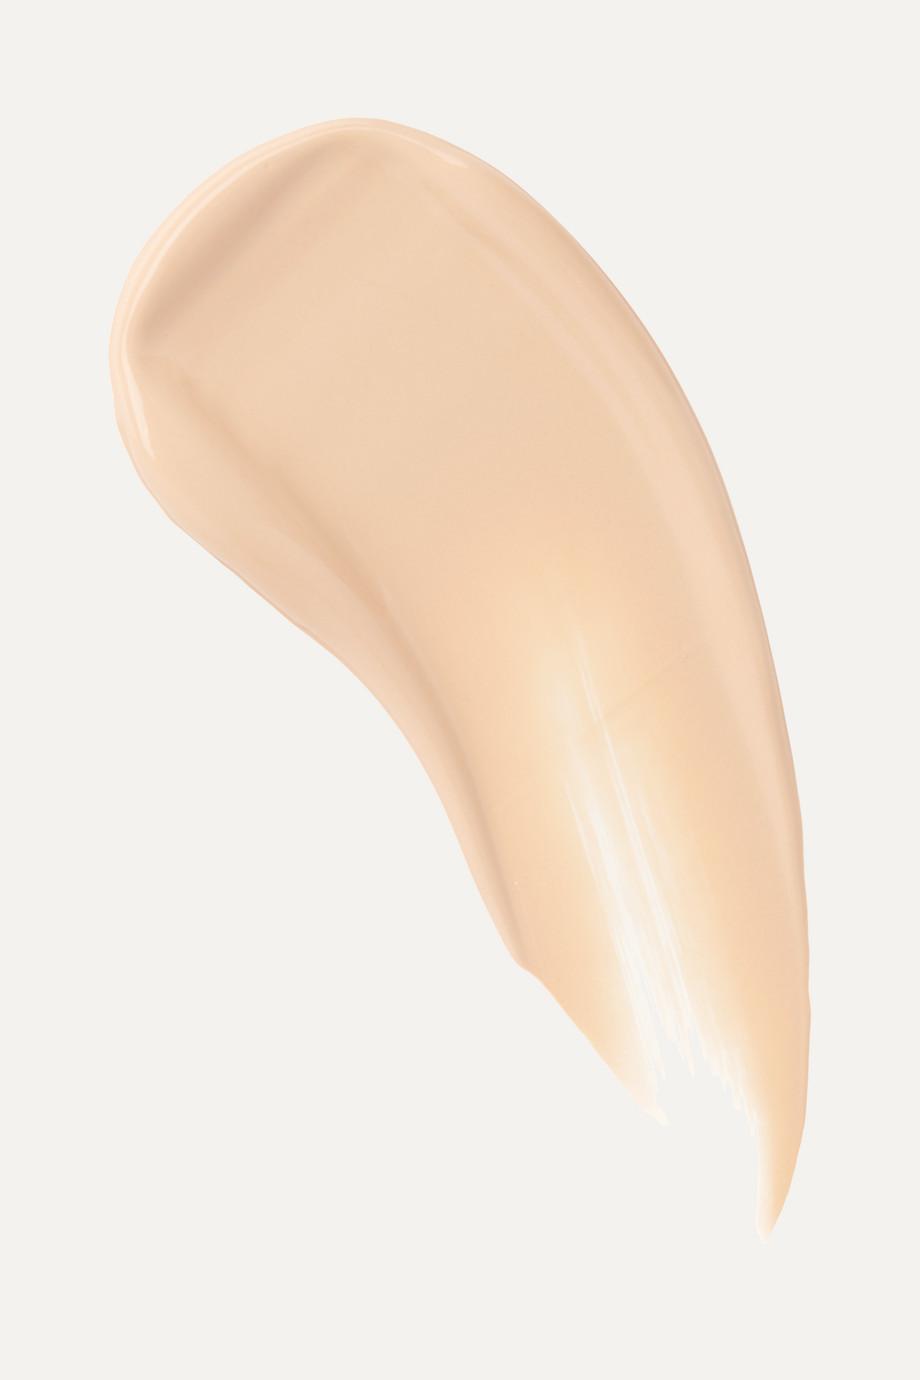 Charlotte Tilbury Magic Foundation Flawless Long-Lasting Coverage SPF15 - Shade 1, 30ml